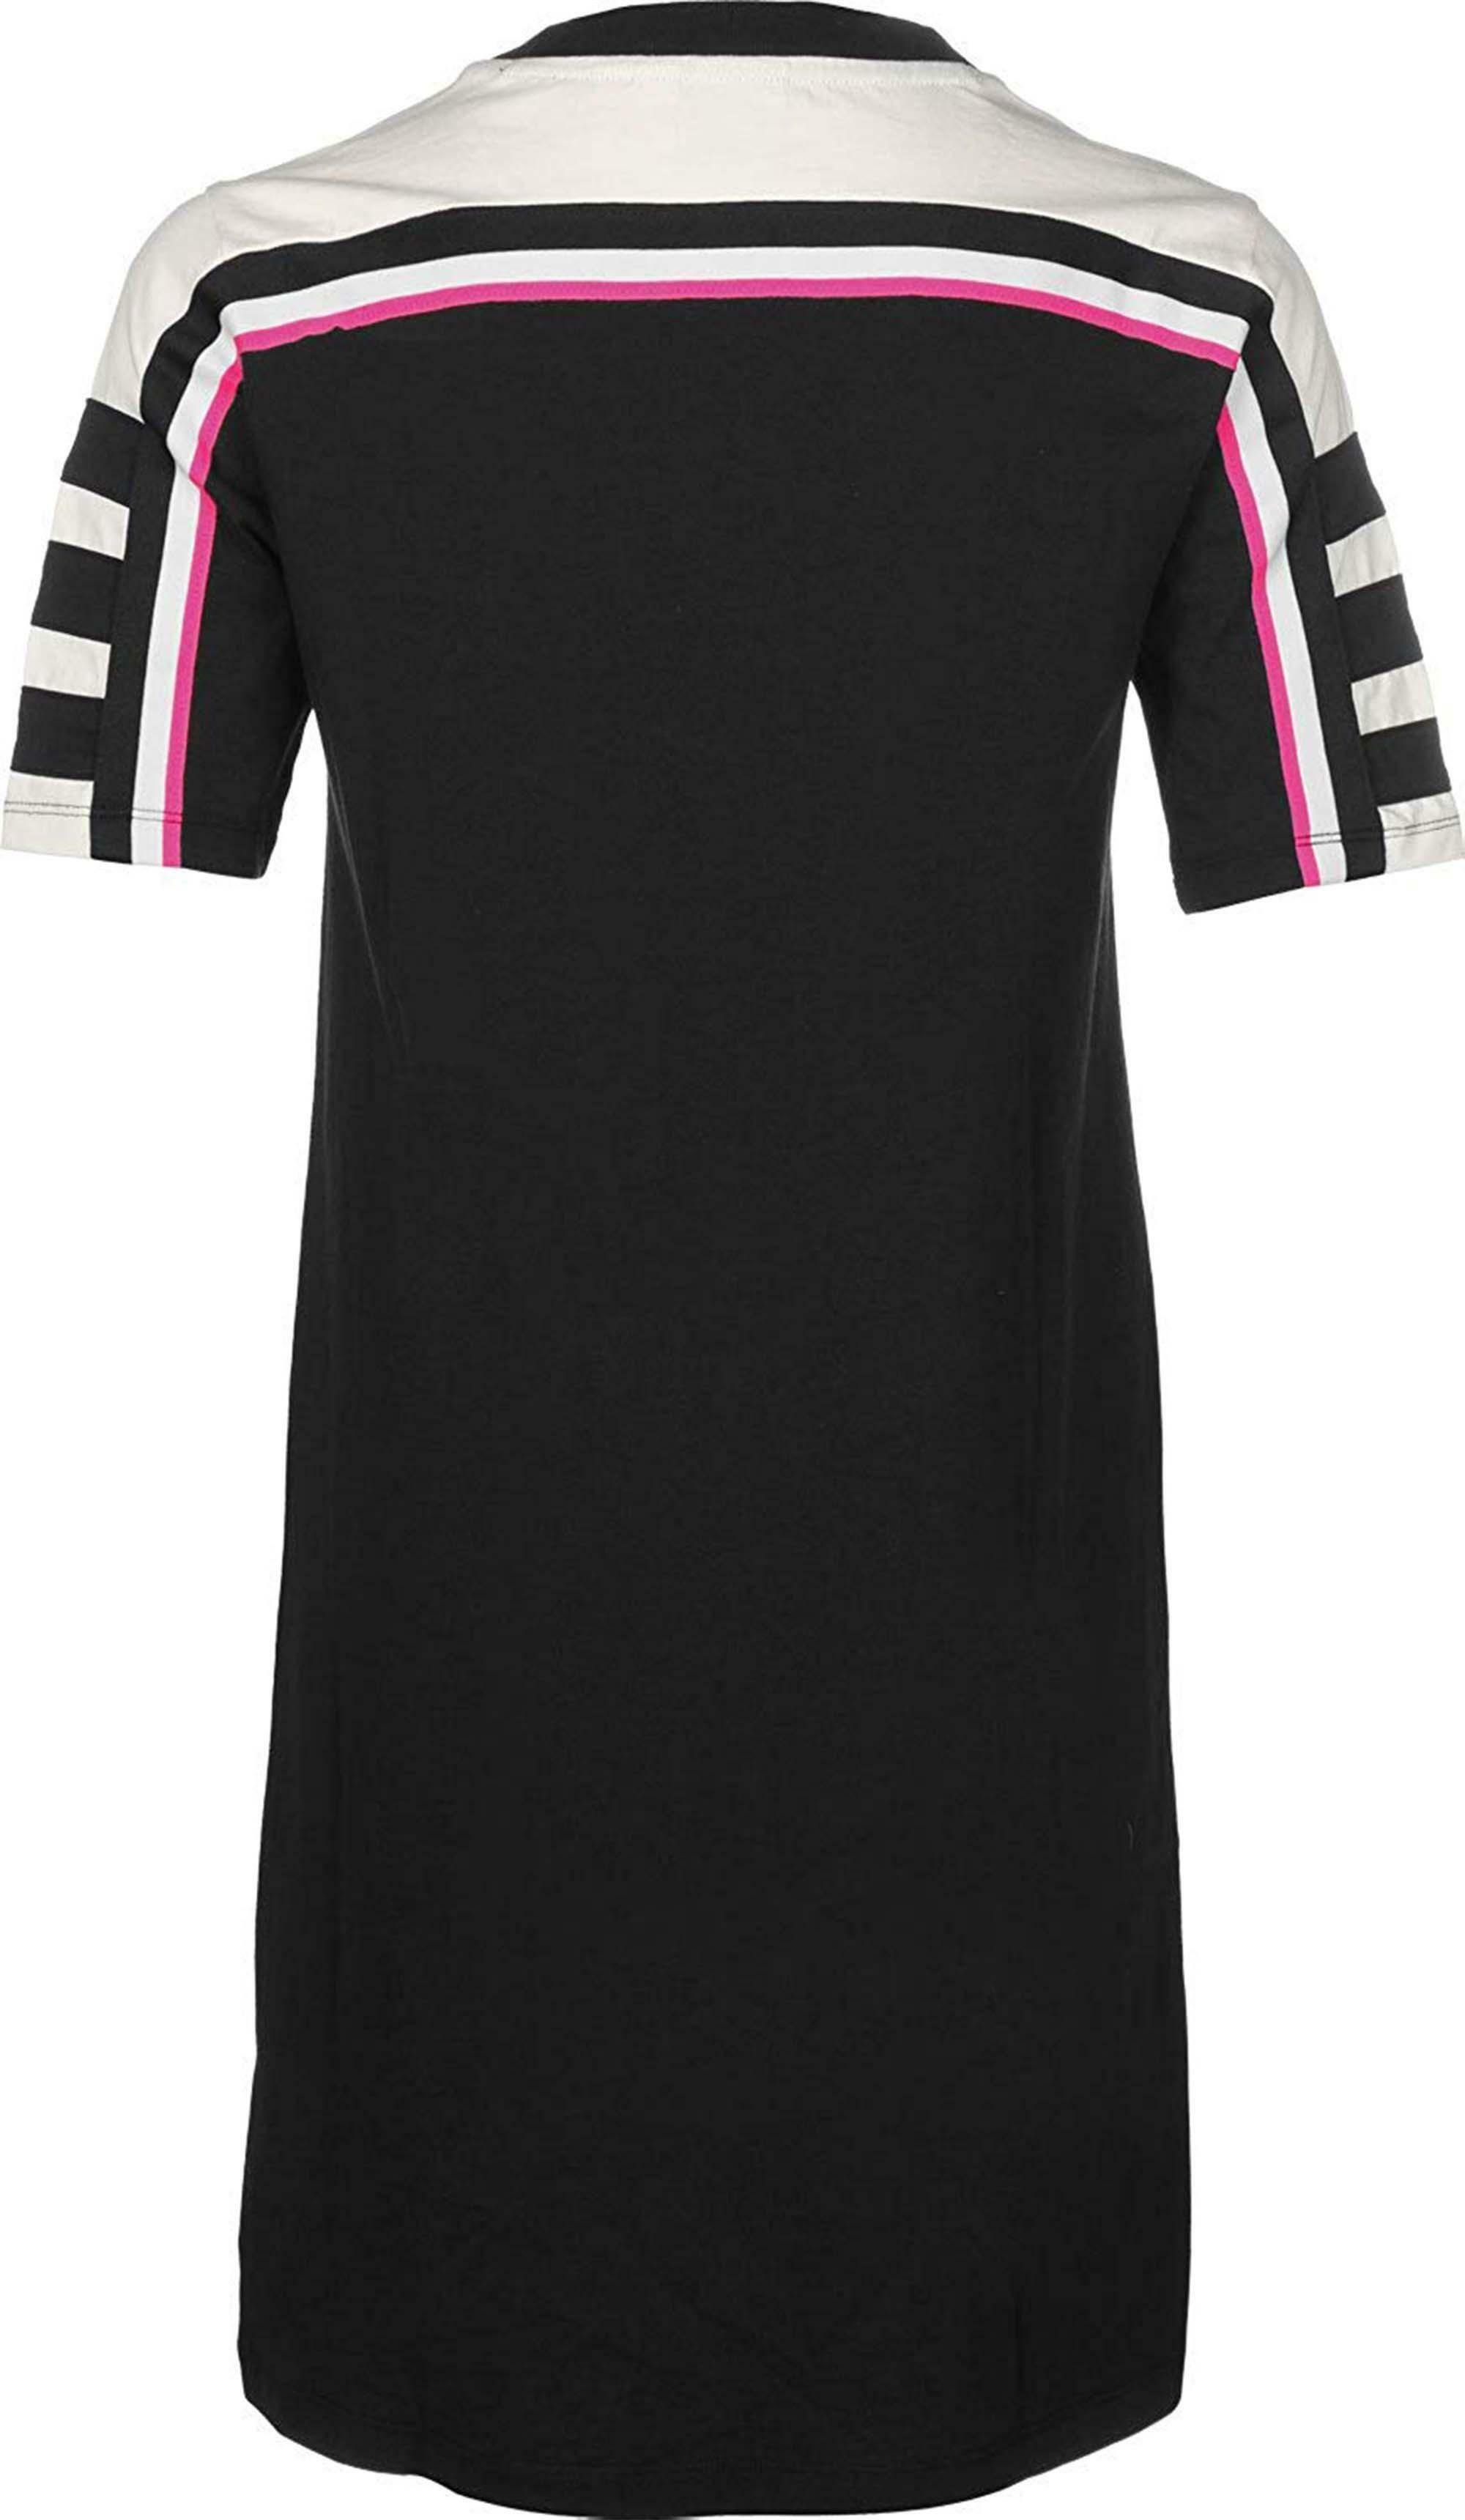 adidas adidas tee vestito donna nero dh4190